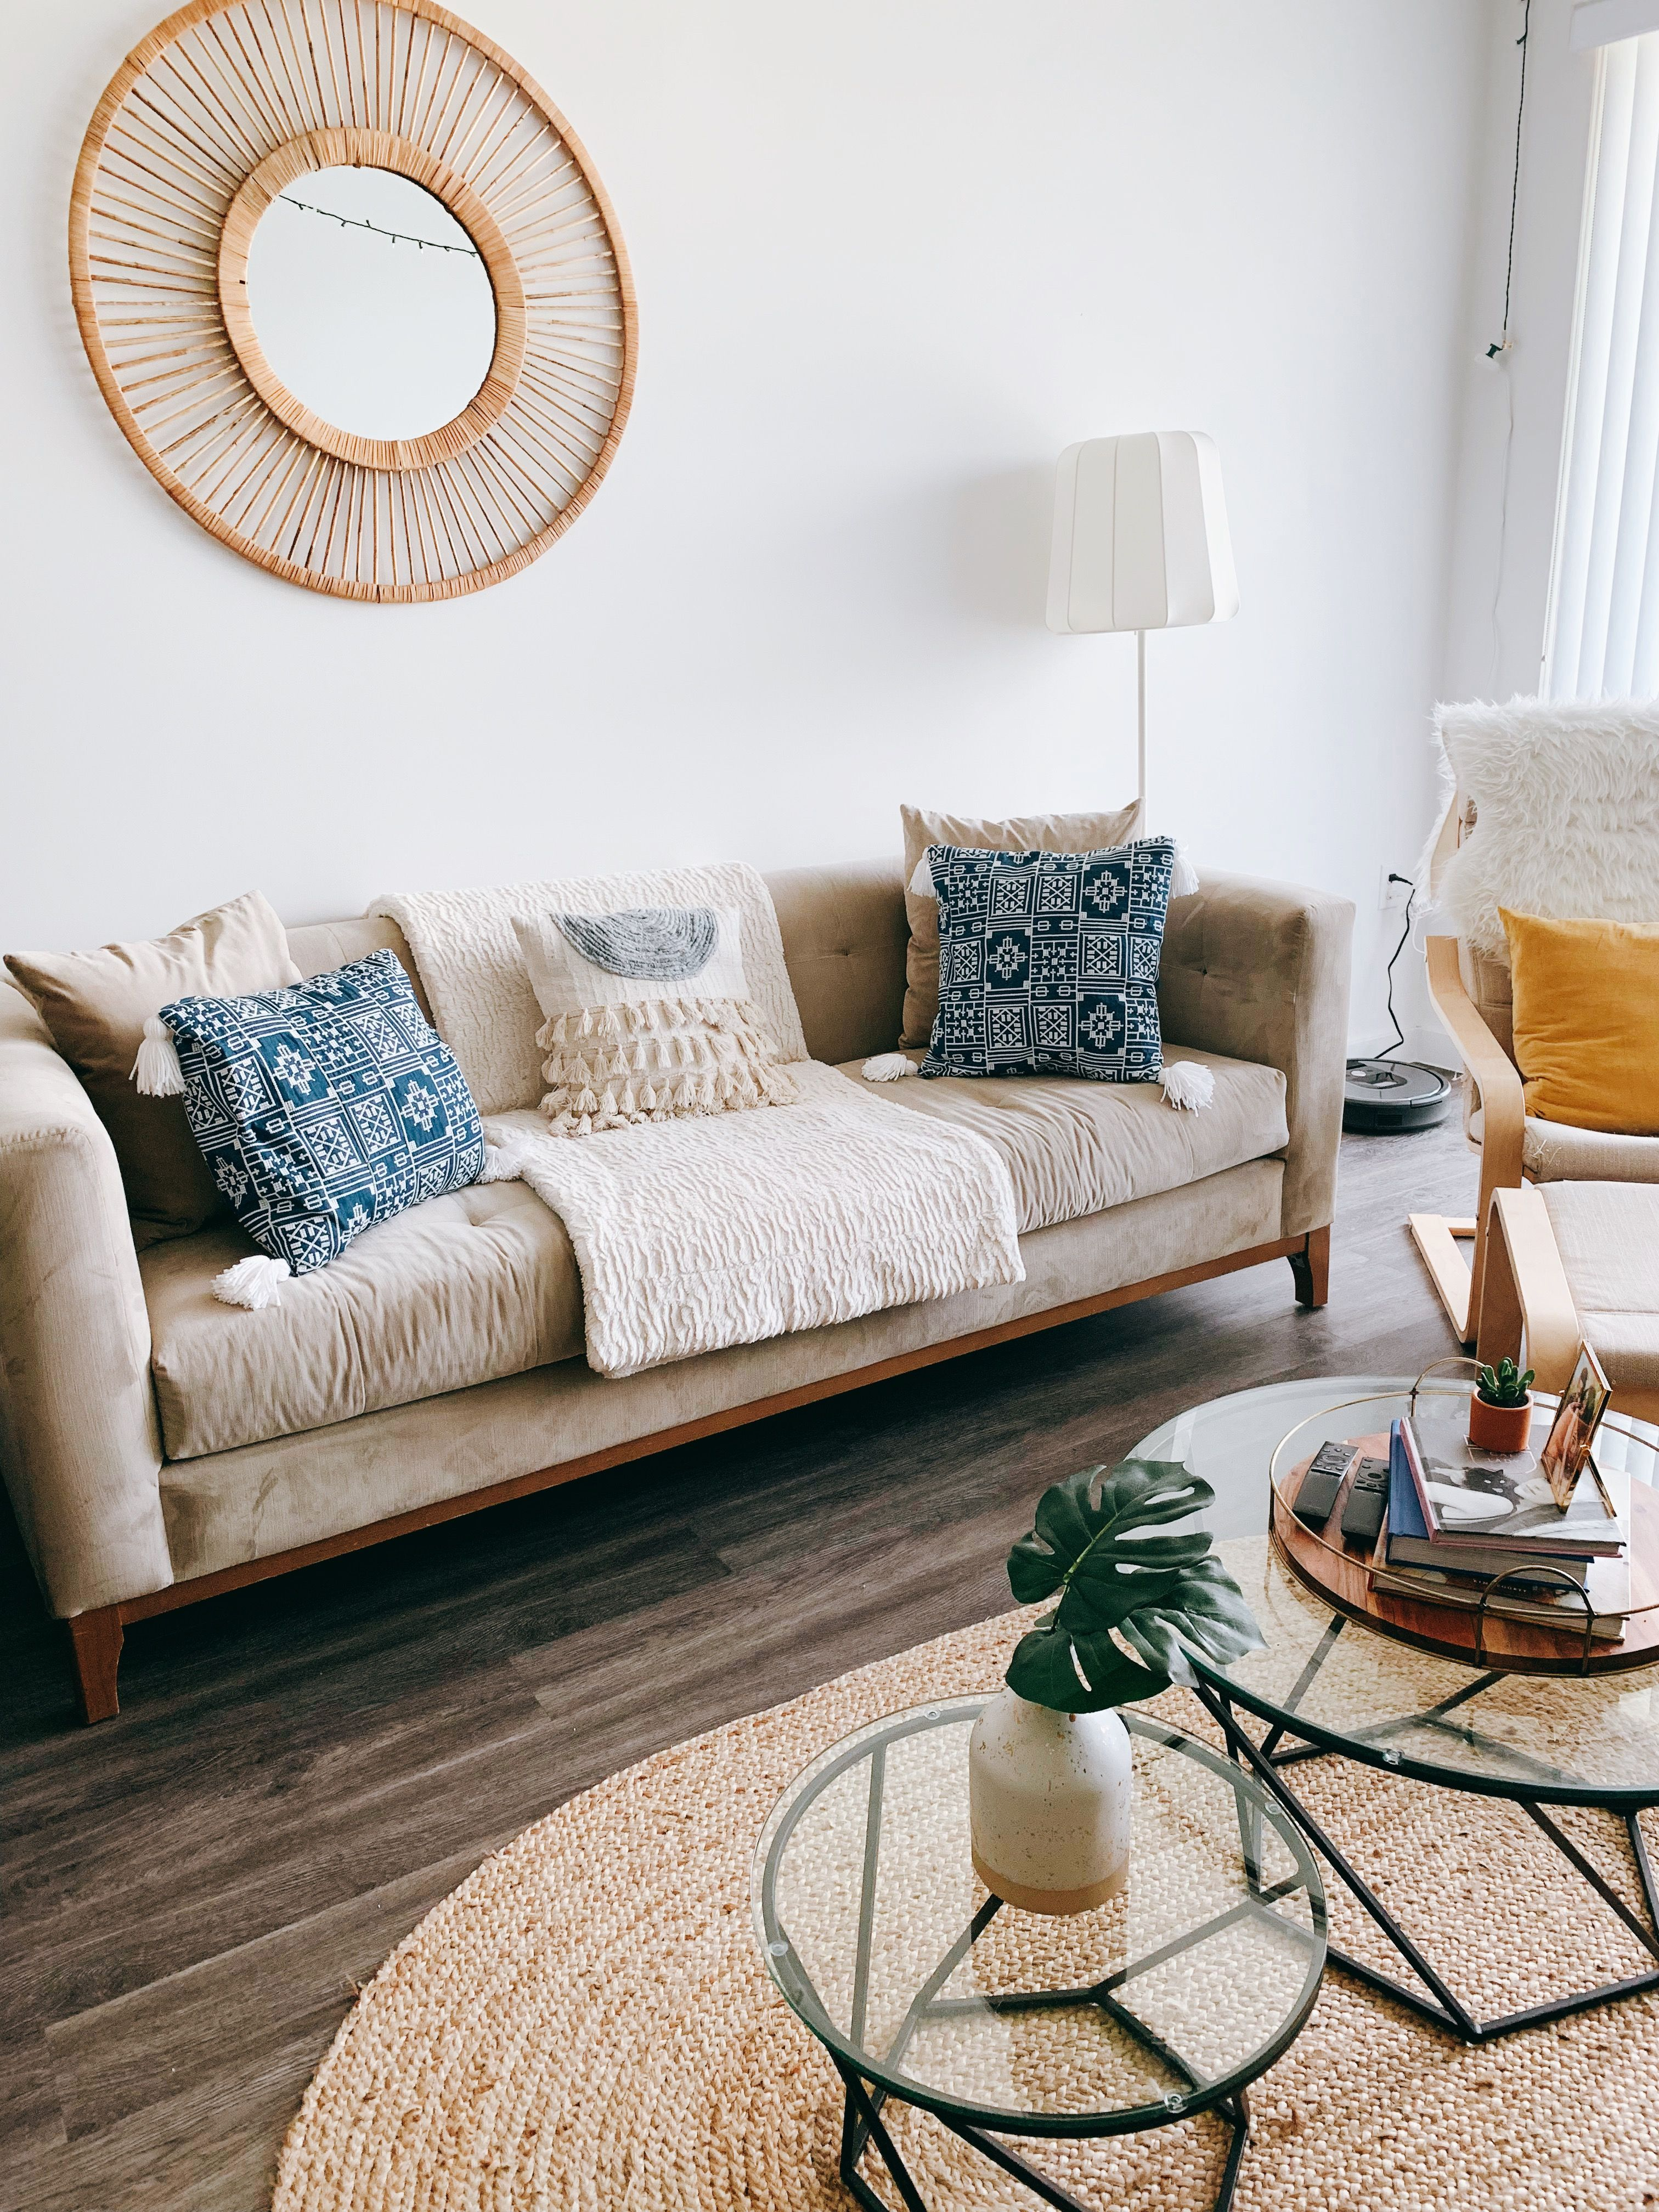 Circle Mirror Beige Couch Boho Style Boho Living Room Beige